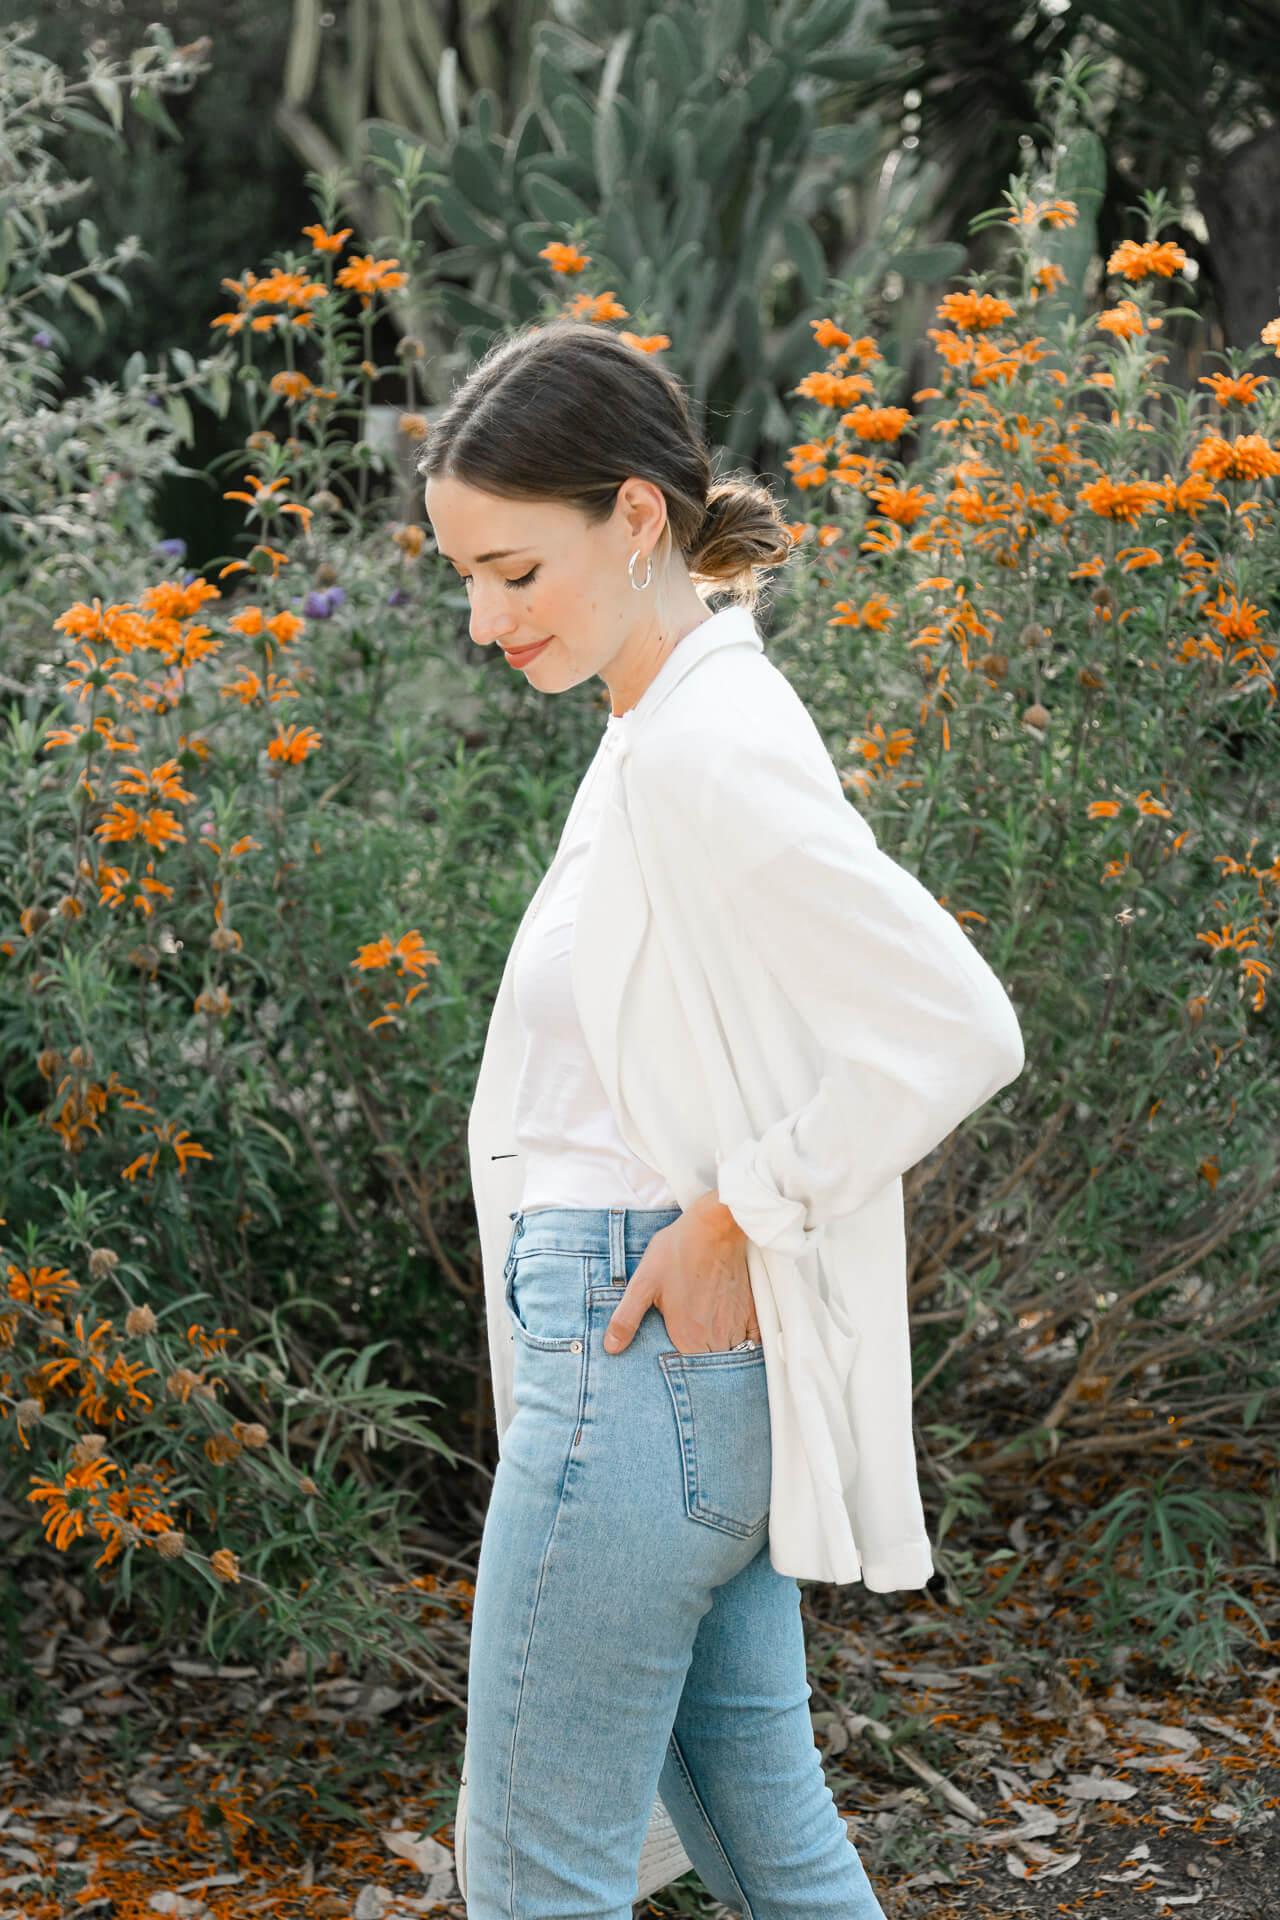 Here's a cute summer outfit idea! - M Loves M @marmar